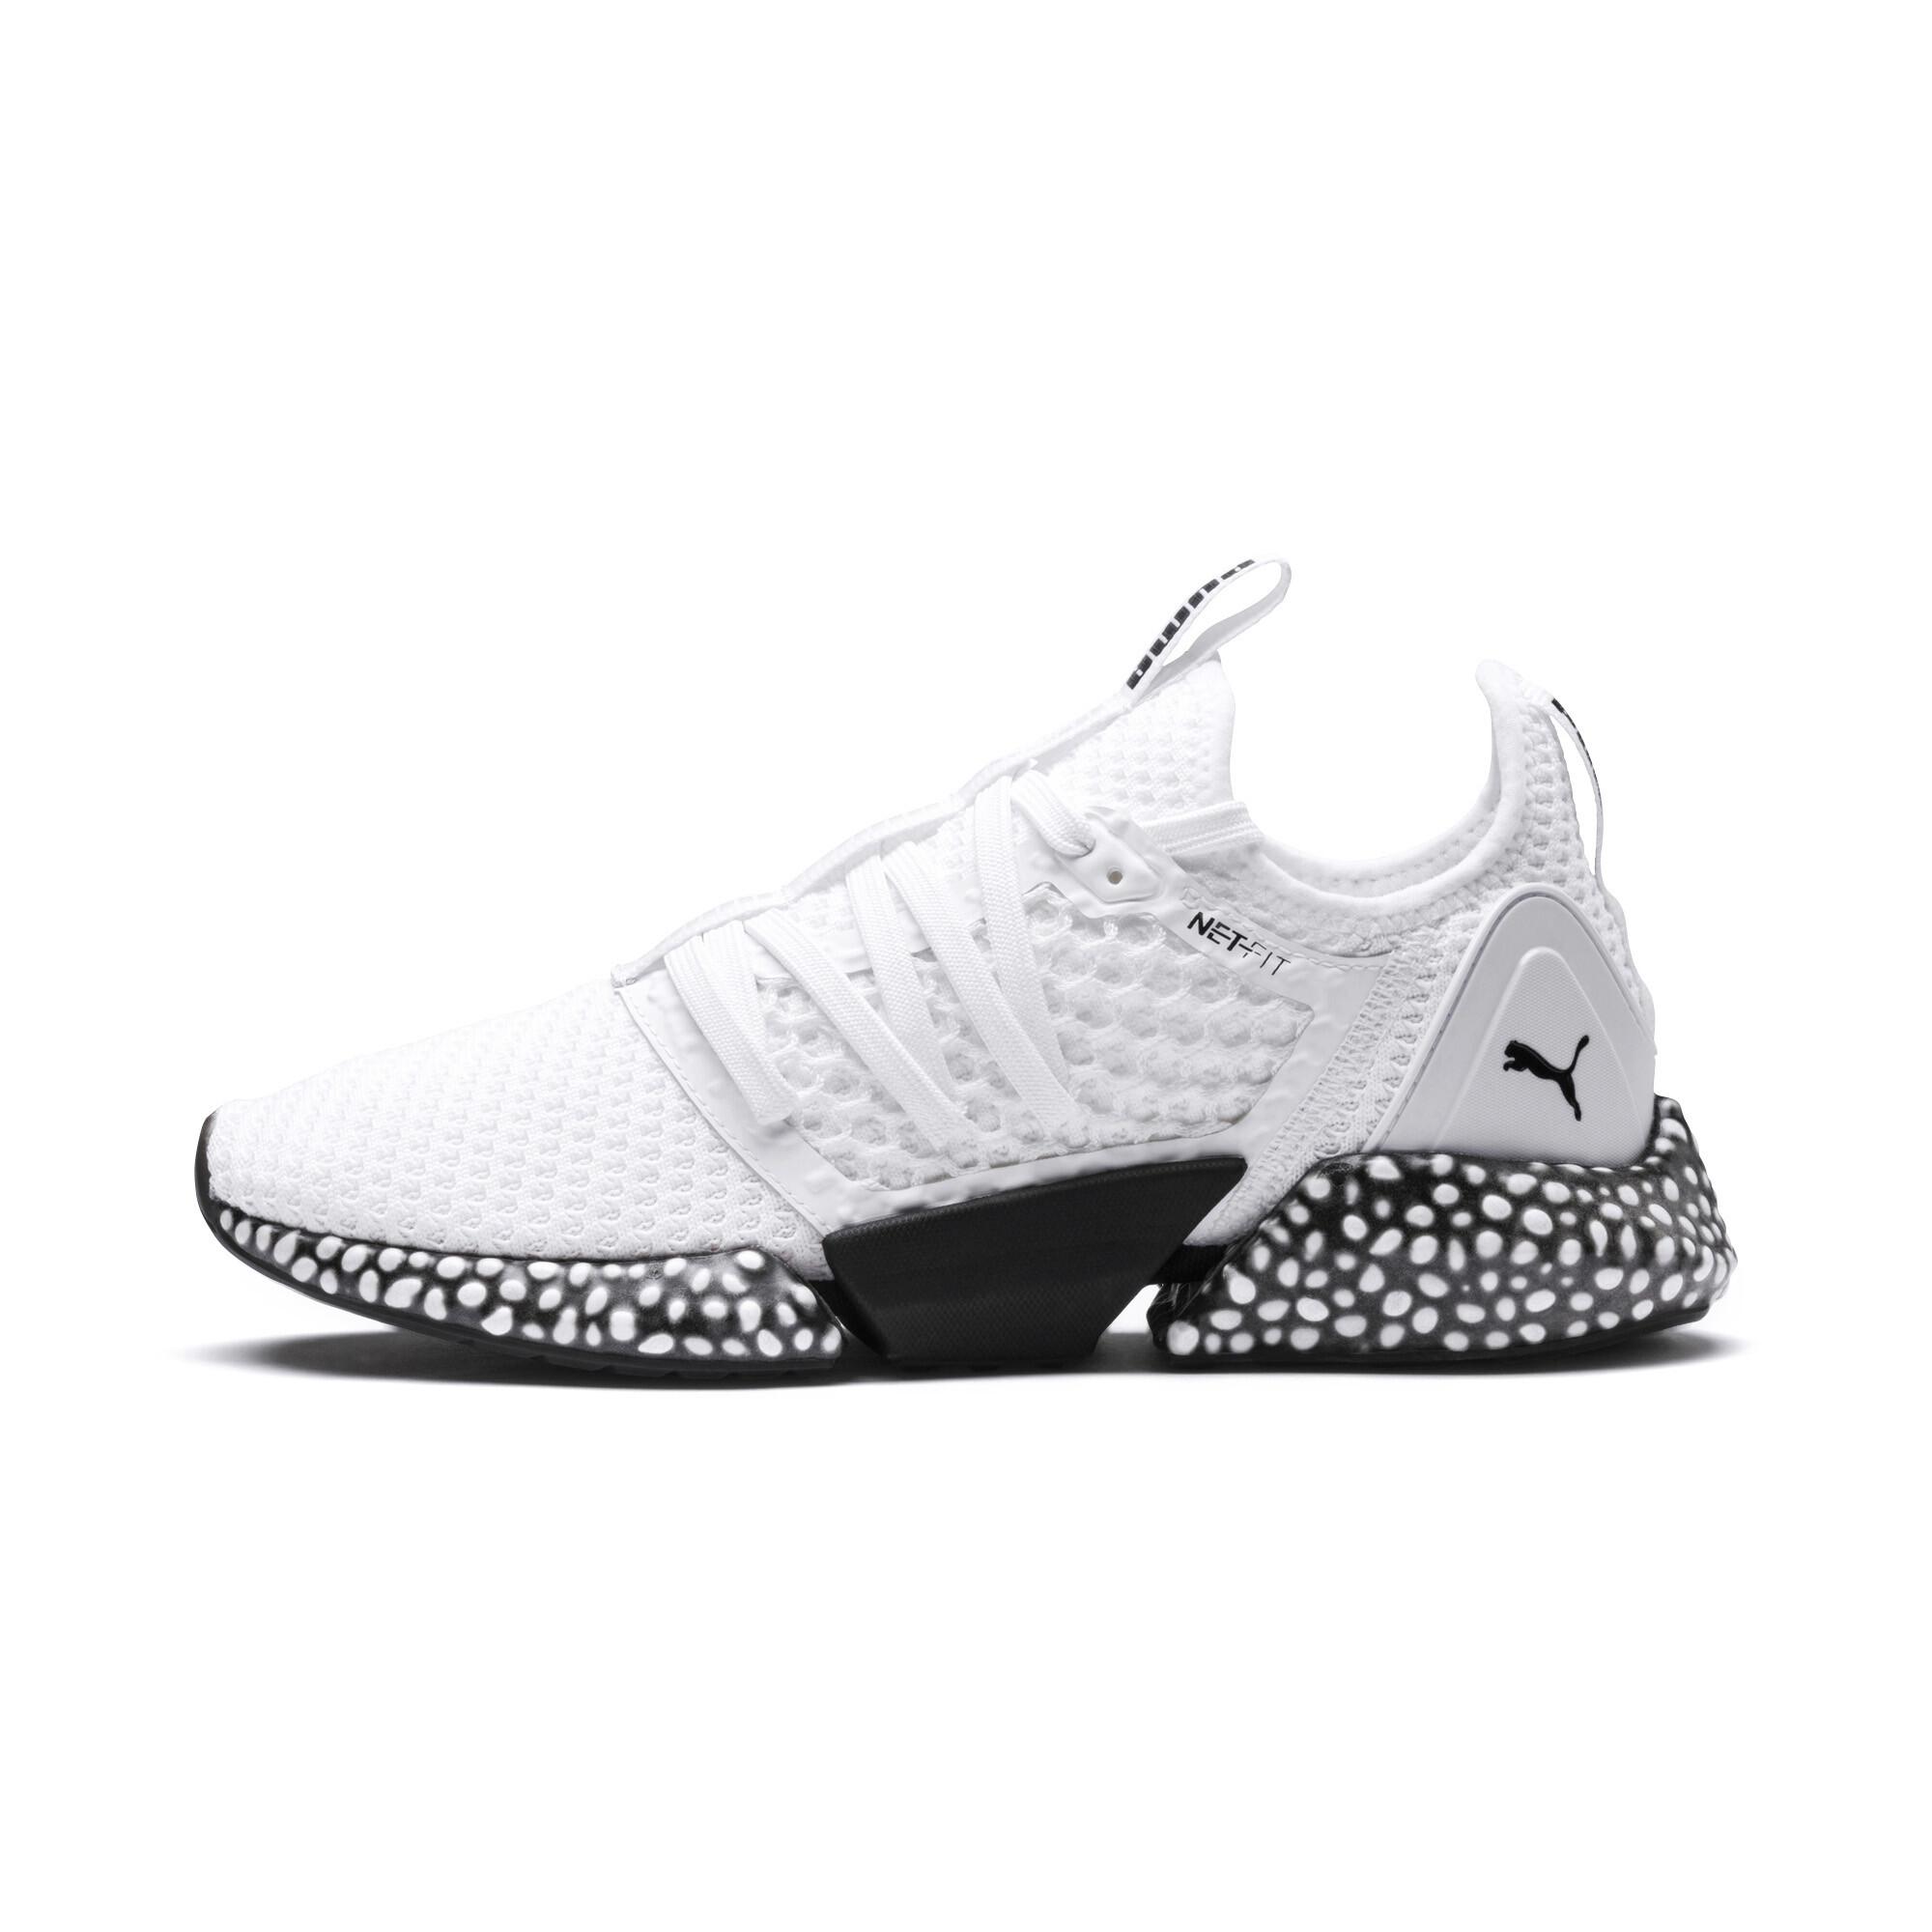 online retailer e8a3c 322fb Image Puma Hybrid Rocket NETFIT Men s Running Shoes  1